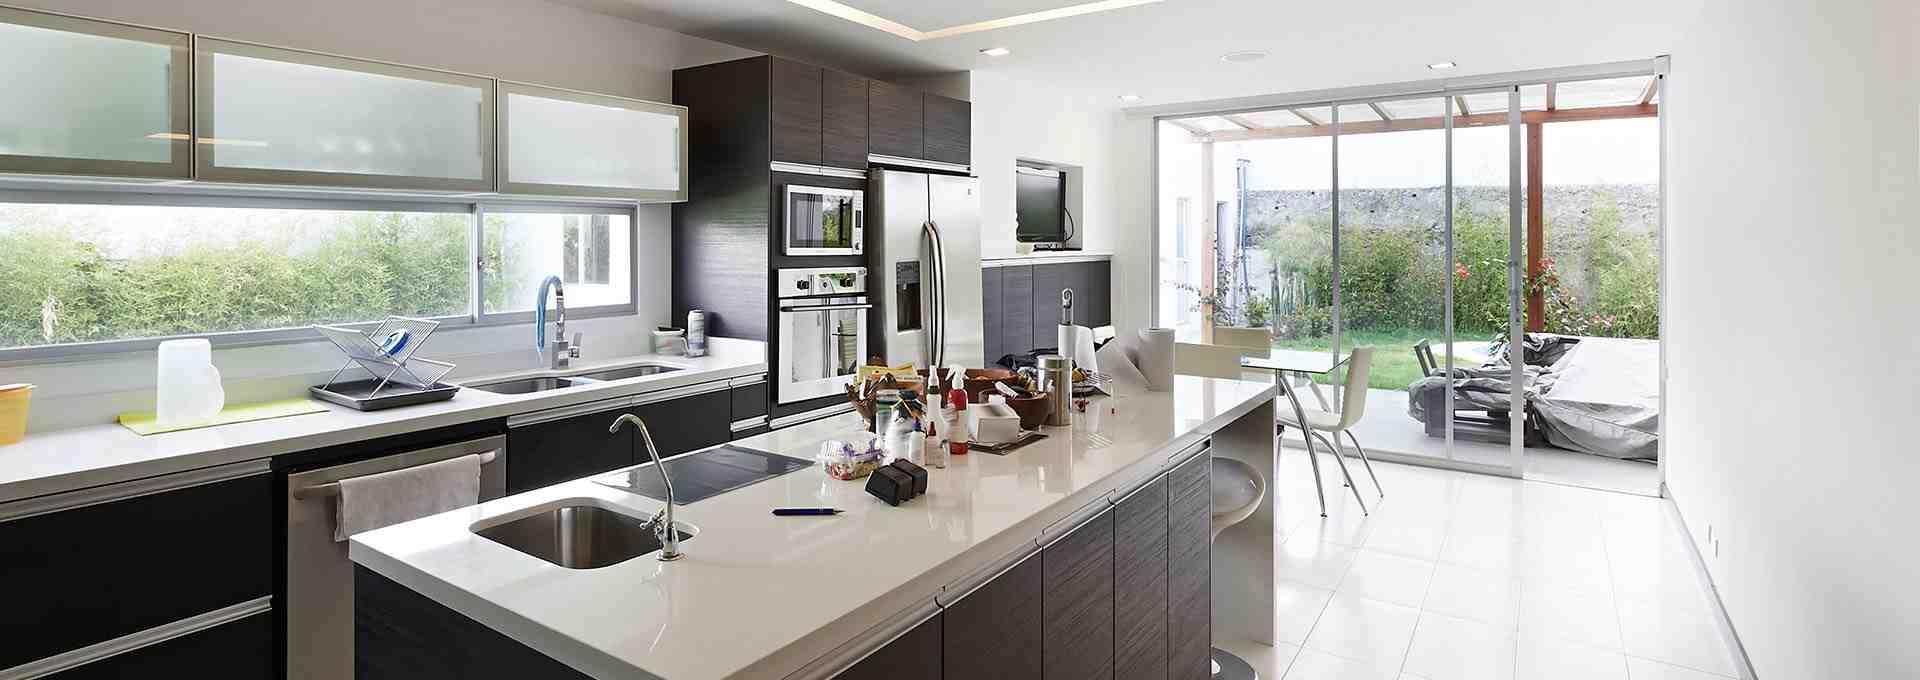 Inmobiliaria casas y apartamentos pereira risaralda - Arquitectura pereira ...